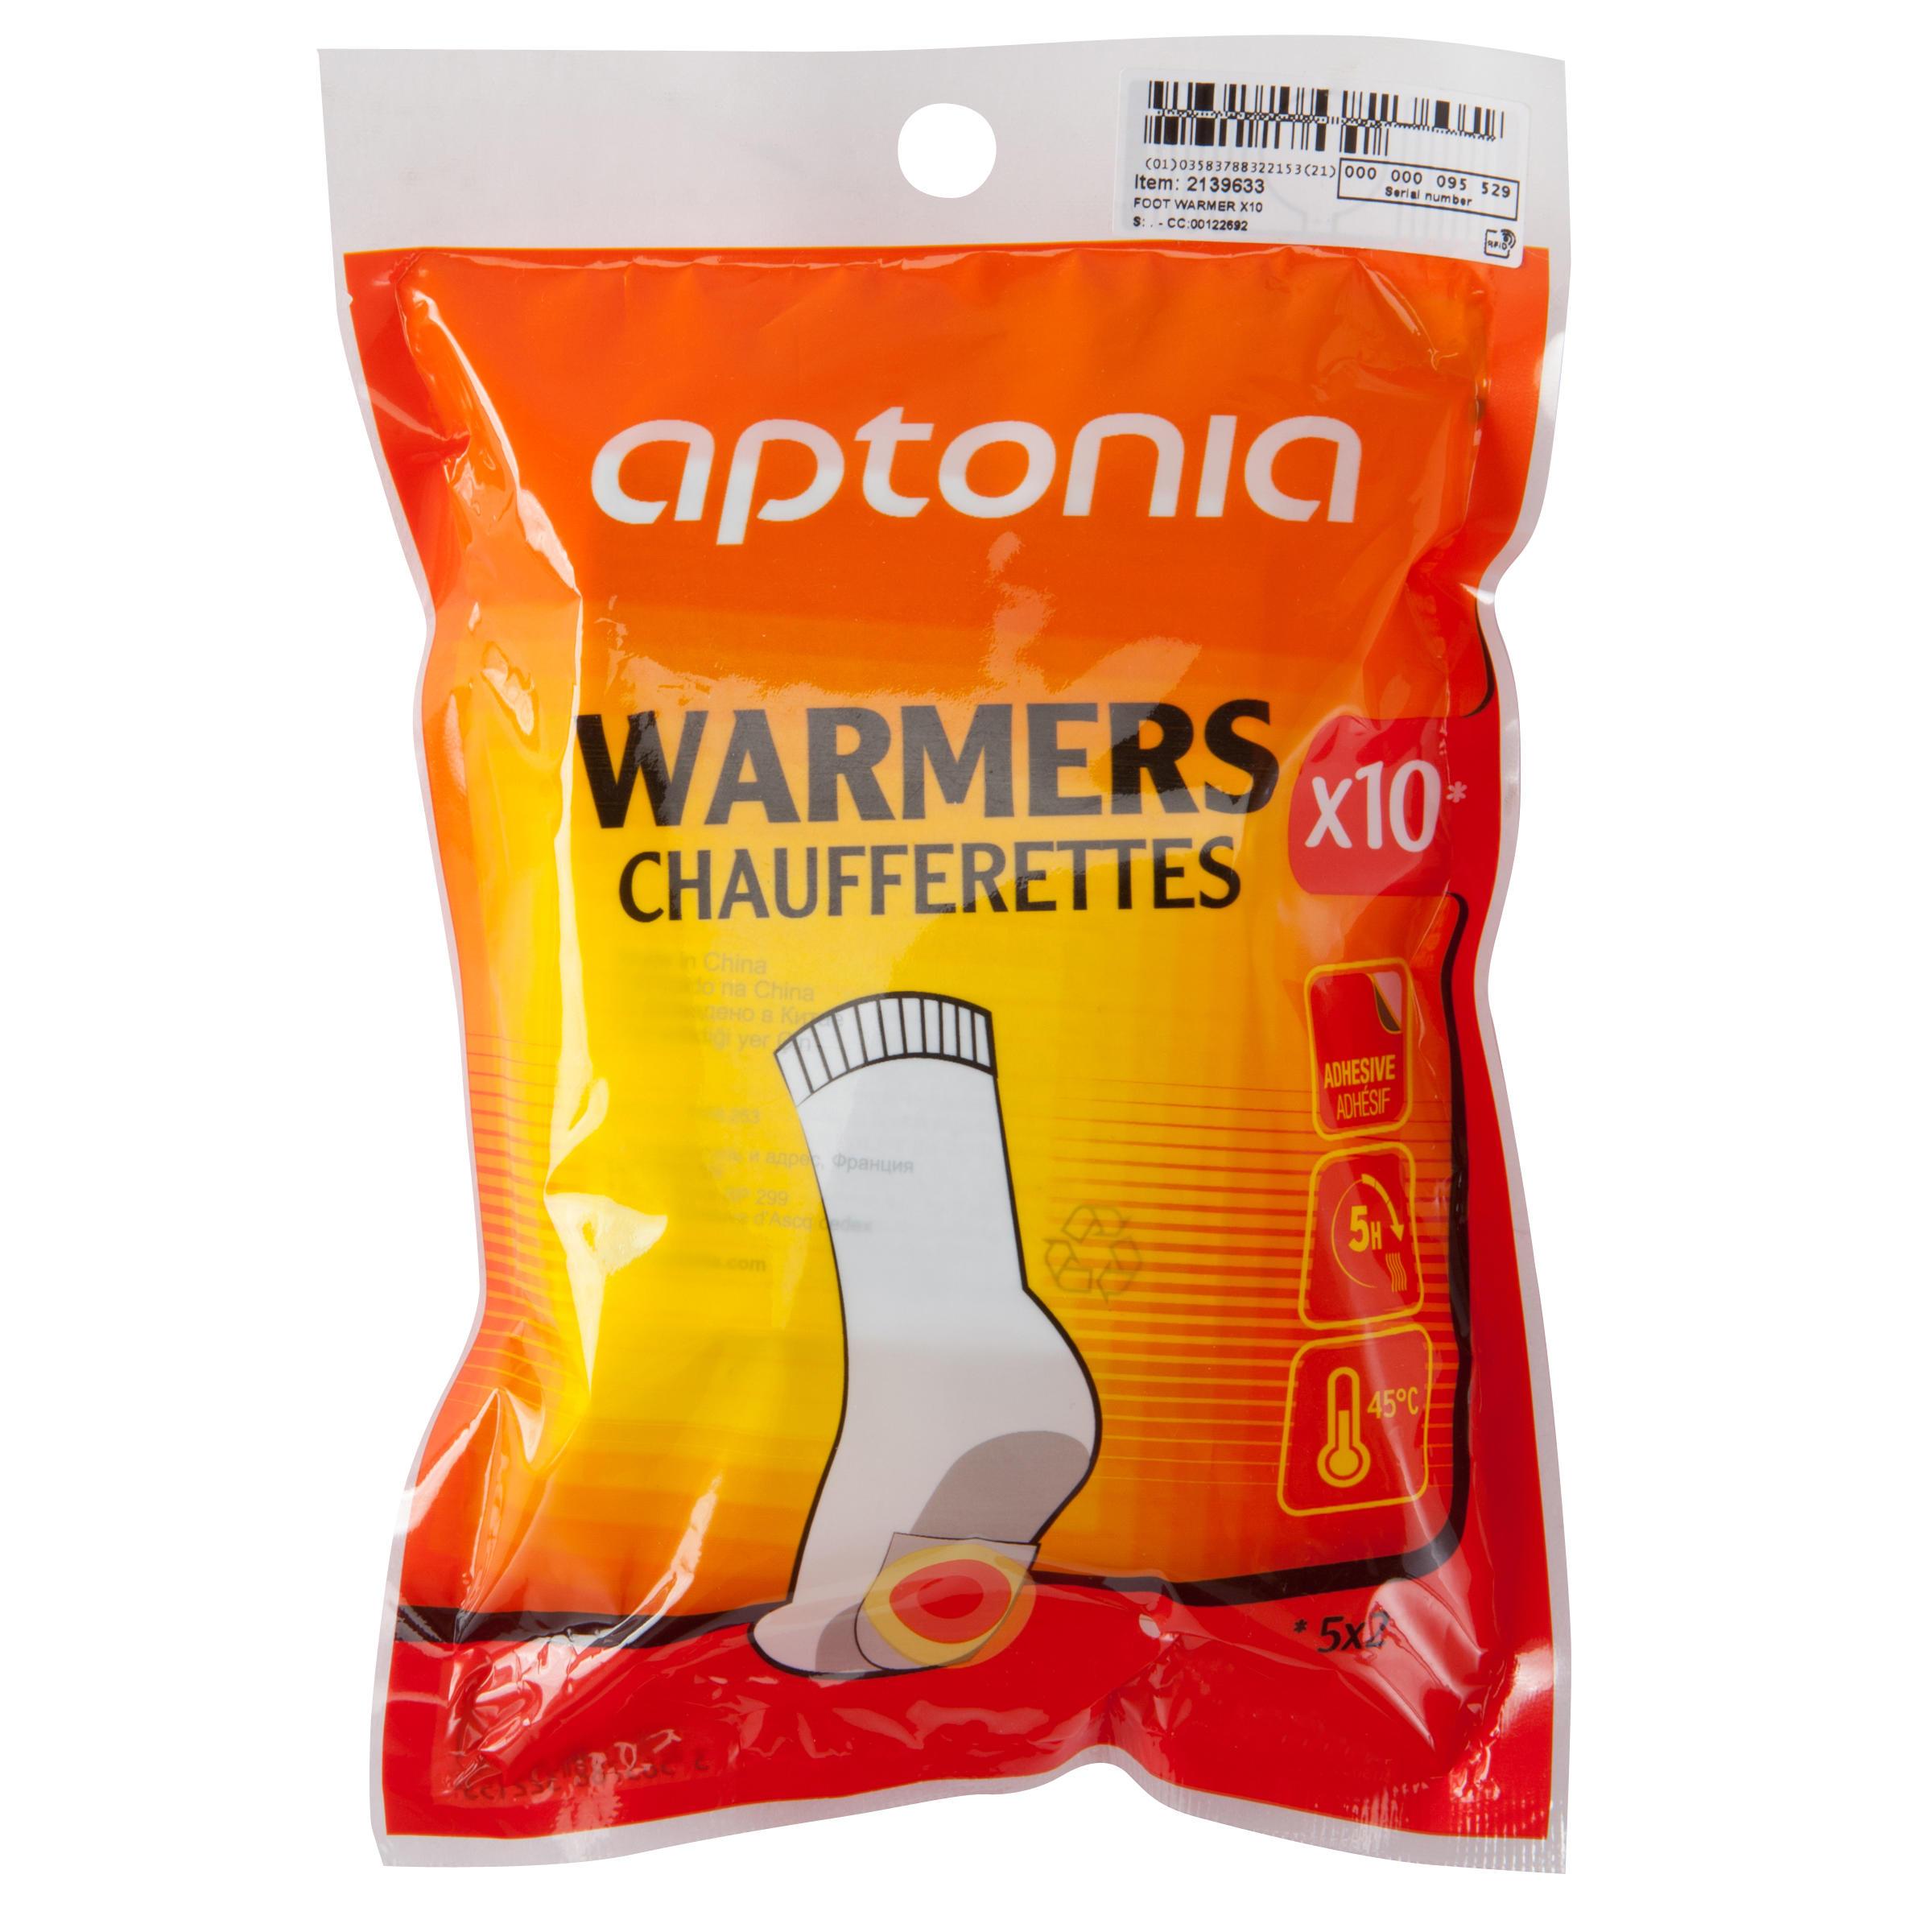 Aptonia Voetwarmers x10 thumbnail